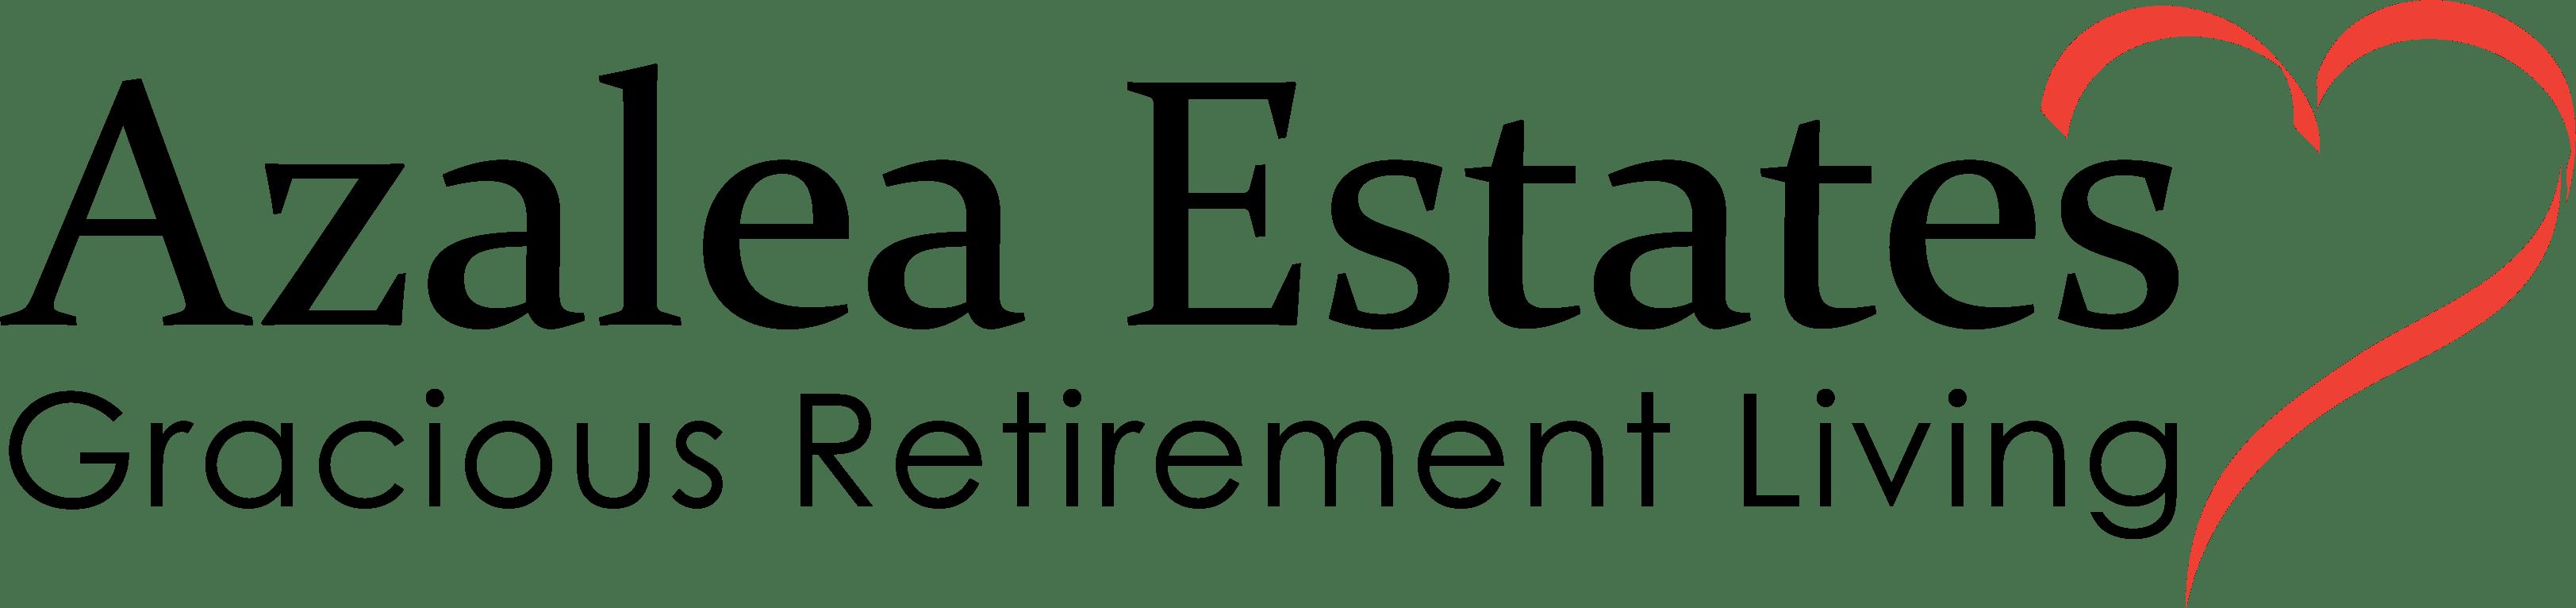 Azalea Estates Gracious Retirement Living